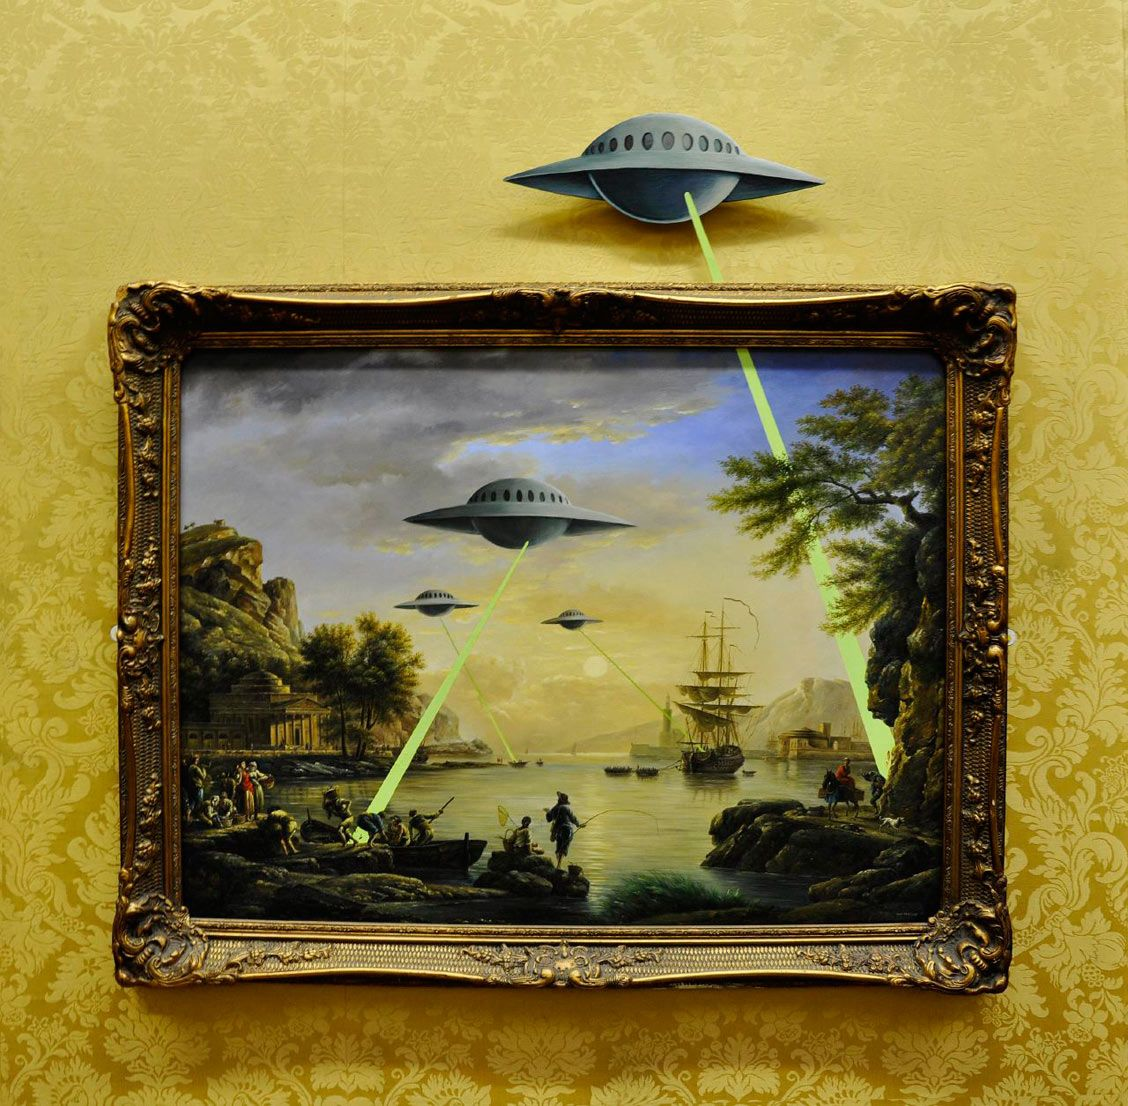 Nonconformist — banksyarts: Alien Invasion Banksy [src] | Art ...